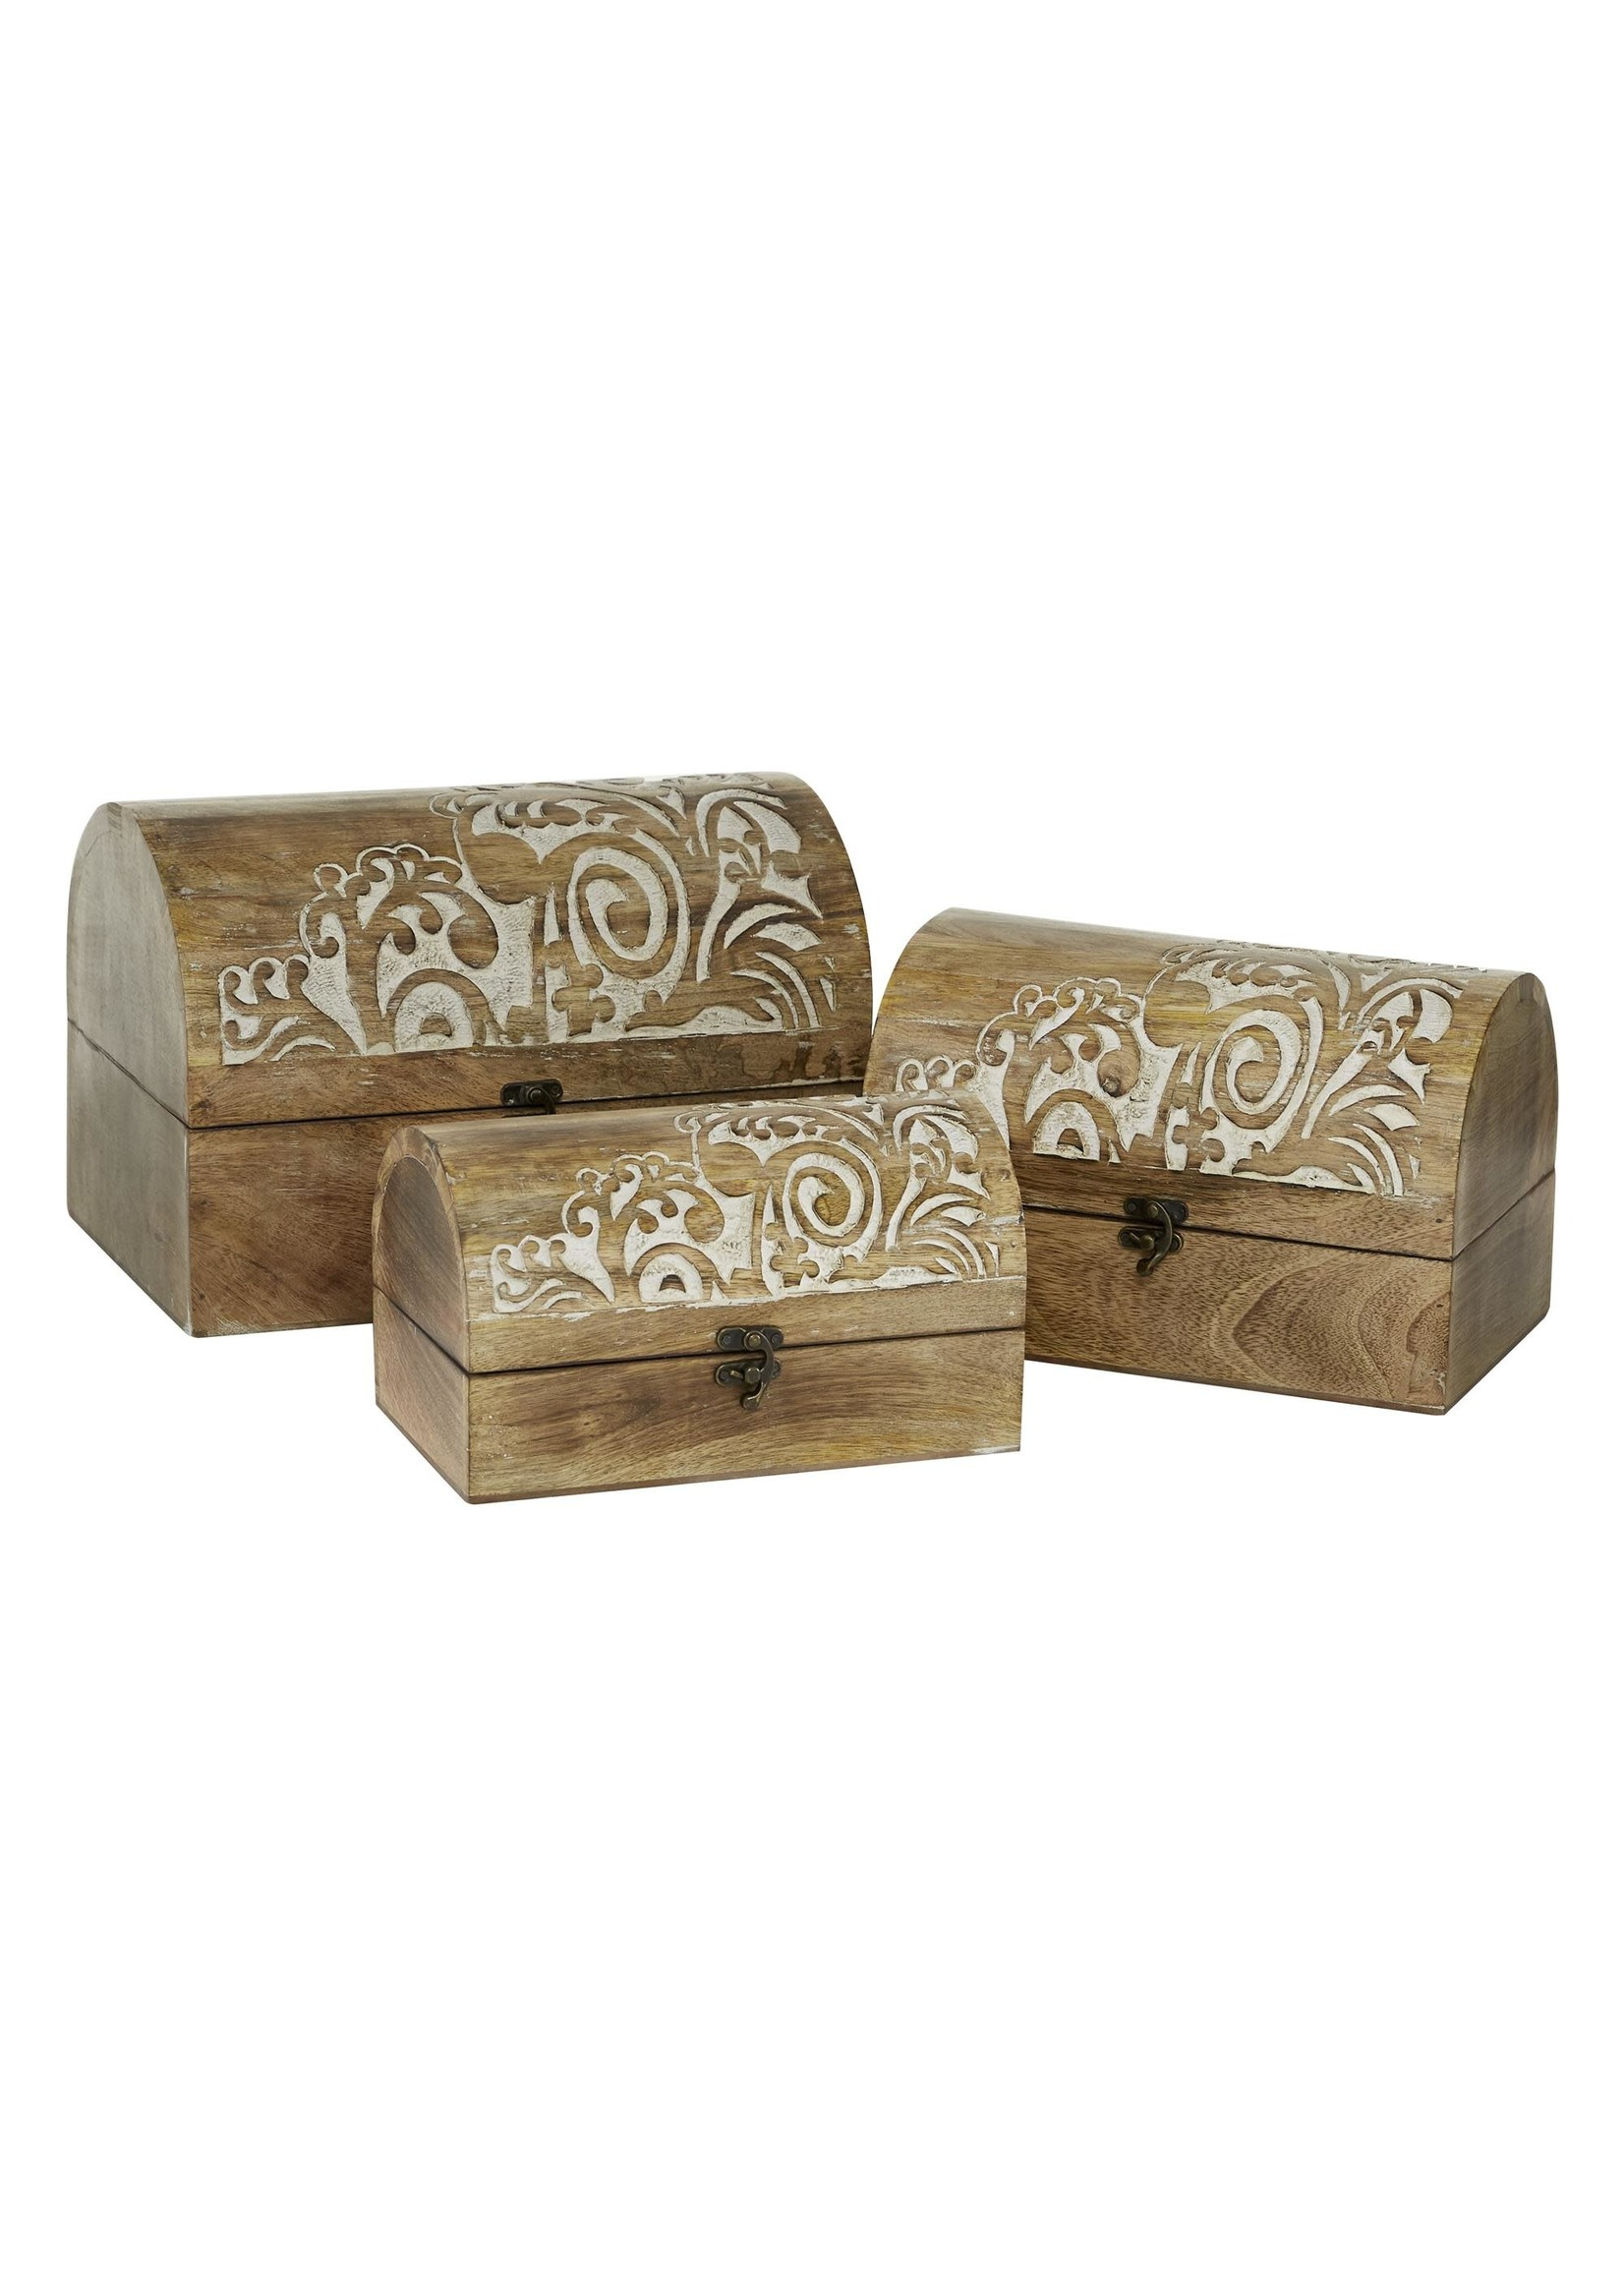 UMA Enterprises UMA Wood Box Set of 3